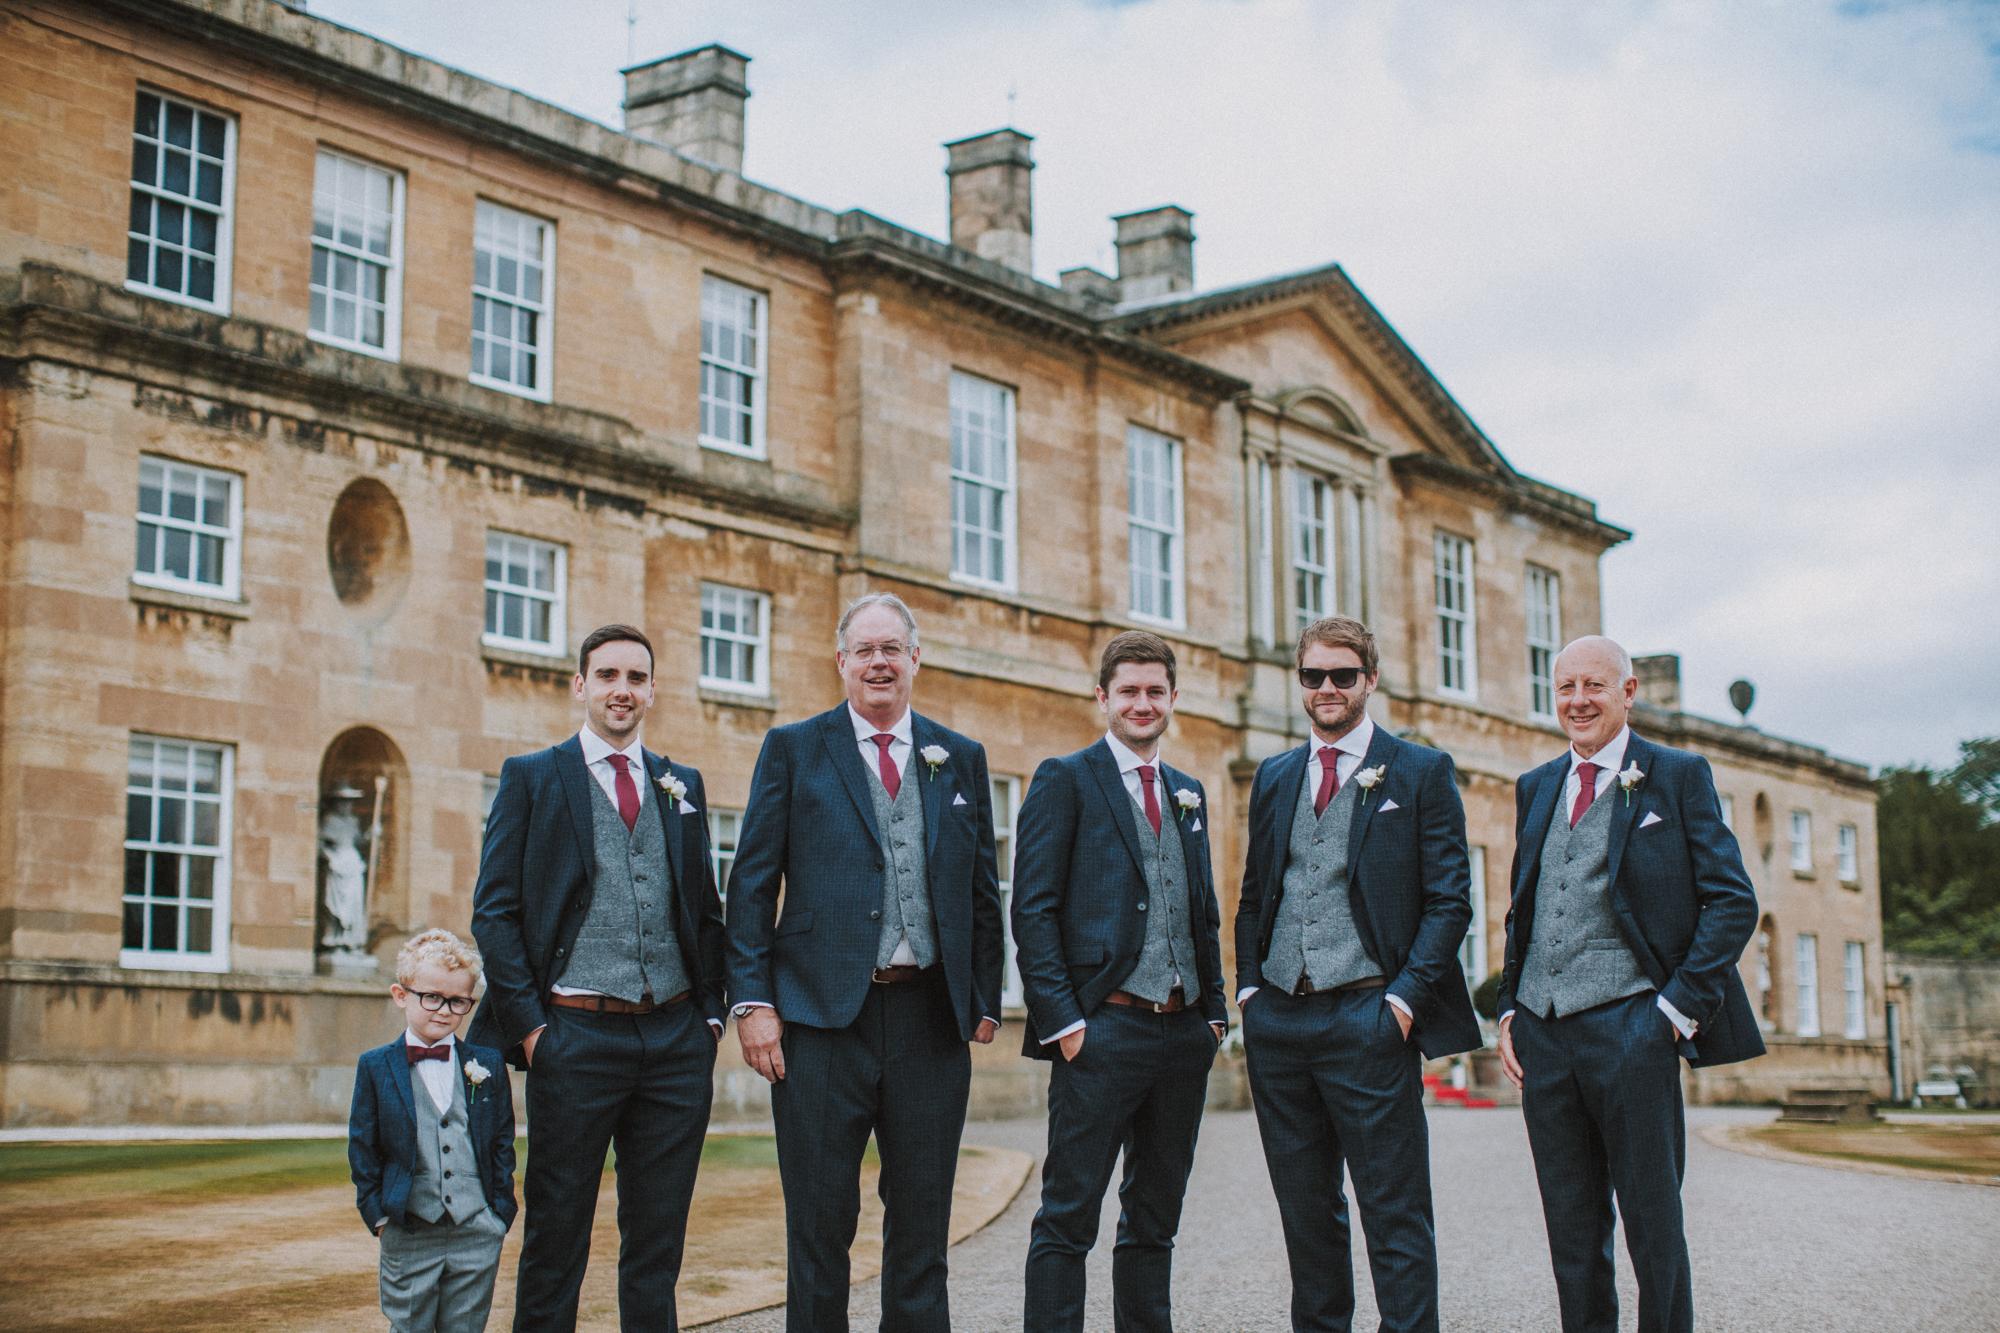 bowcliffe hall wedding photographers yorkshire-15.jpg